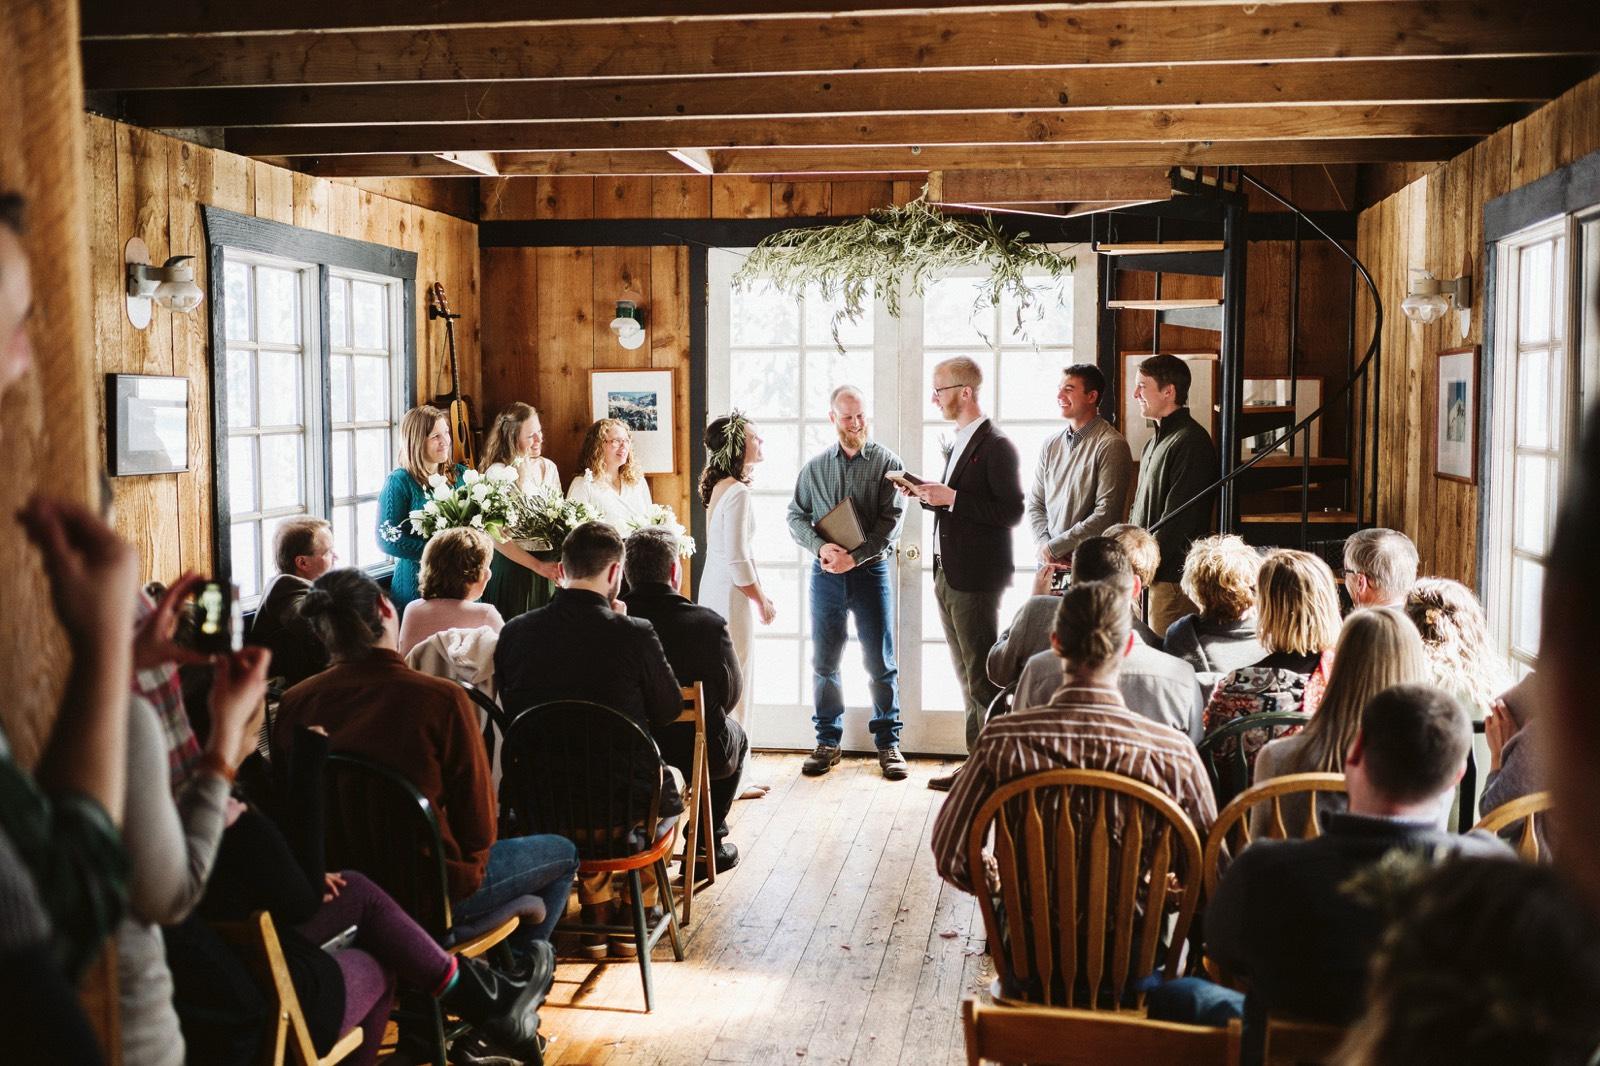 alpine-lakes-high-camp-winter-wedding-34 ALPINE LAKES HIGH CAMP WEDDING